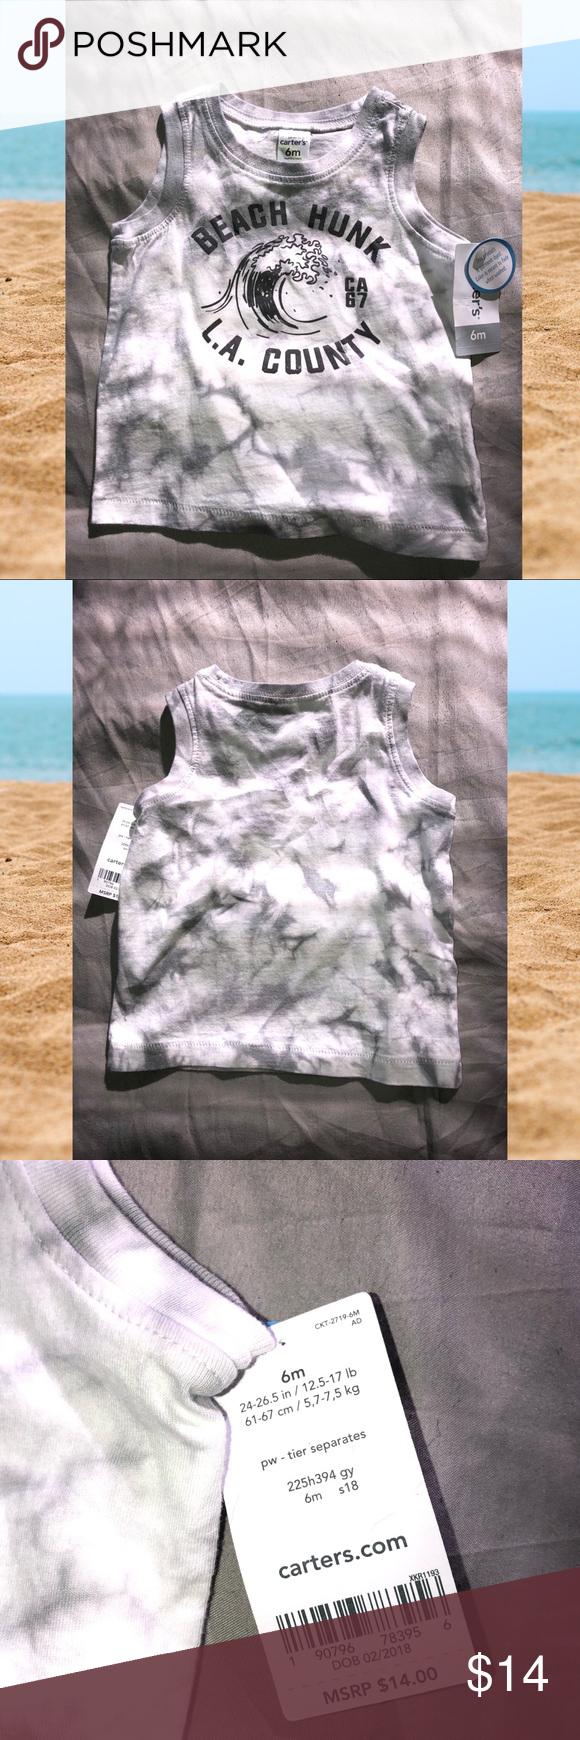 "NWT Carter's Beach Hunk Tie-Dye Tank ""Beach Hunk"" Gray And"